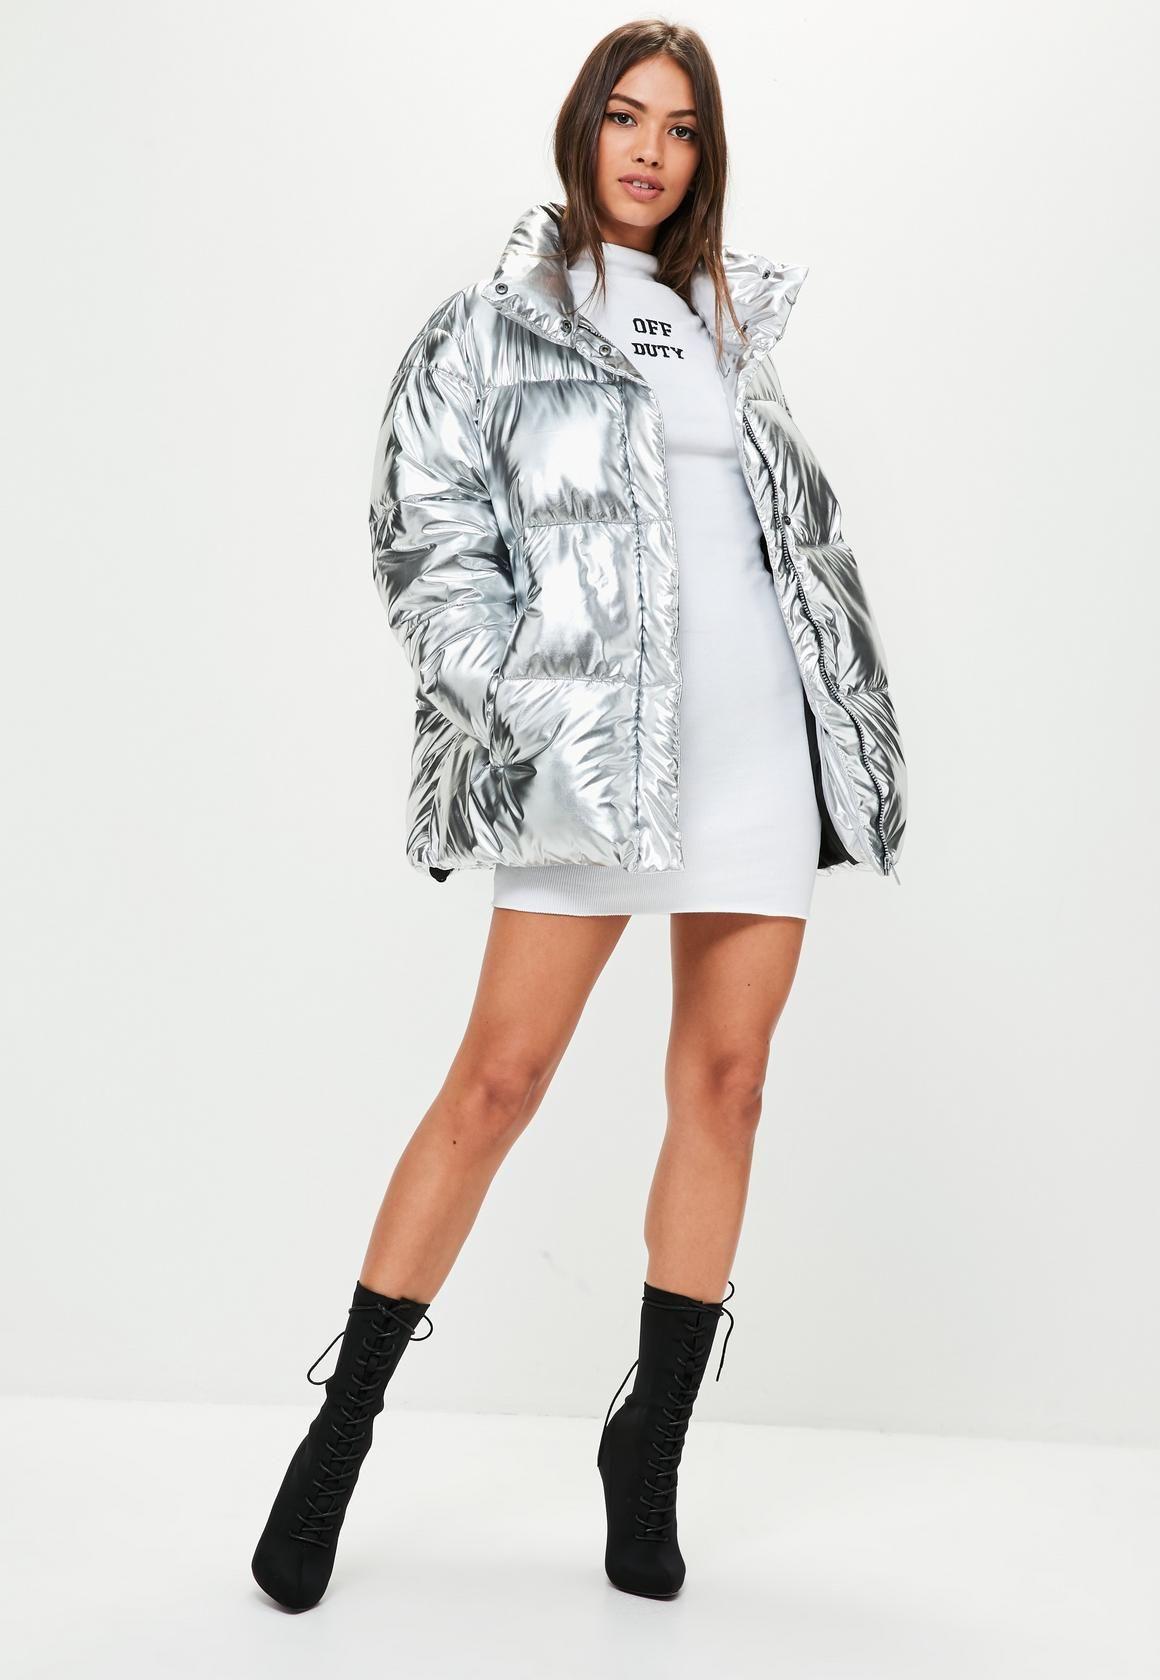 Silver Metallic Puffer Jacket Missguided Silver Jacket Outfit Metallic Jacket Puffer Jacket Outfit [ 1680 x 1160 Pixel ]